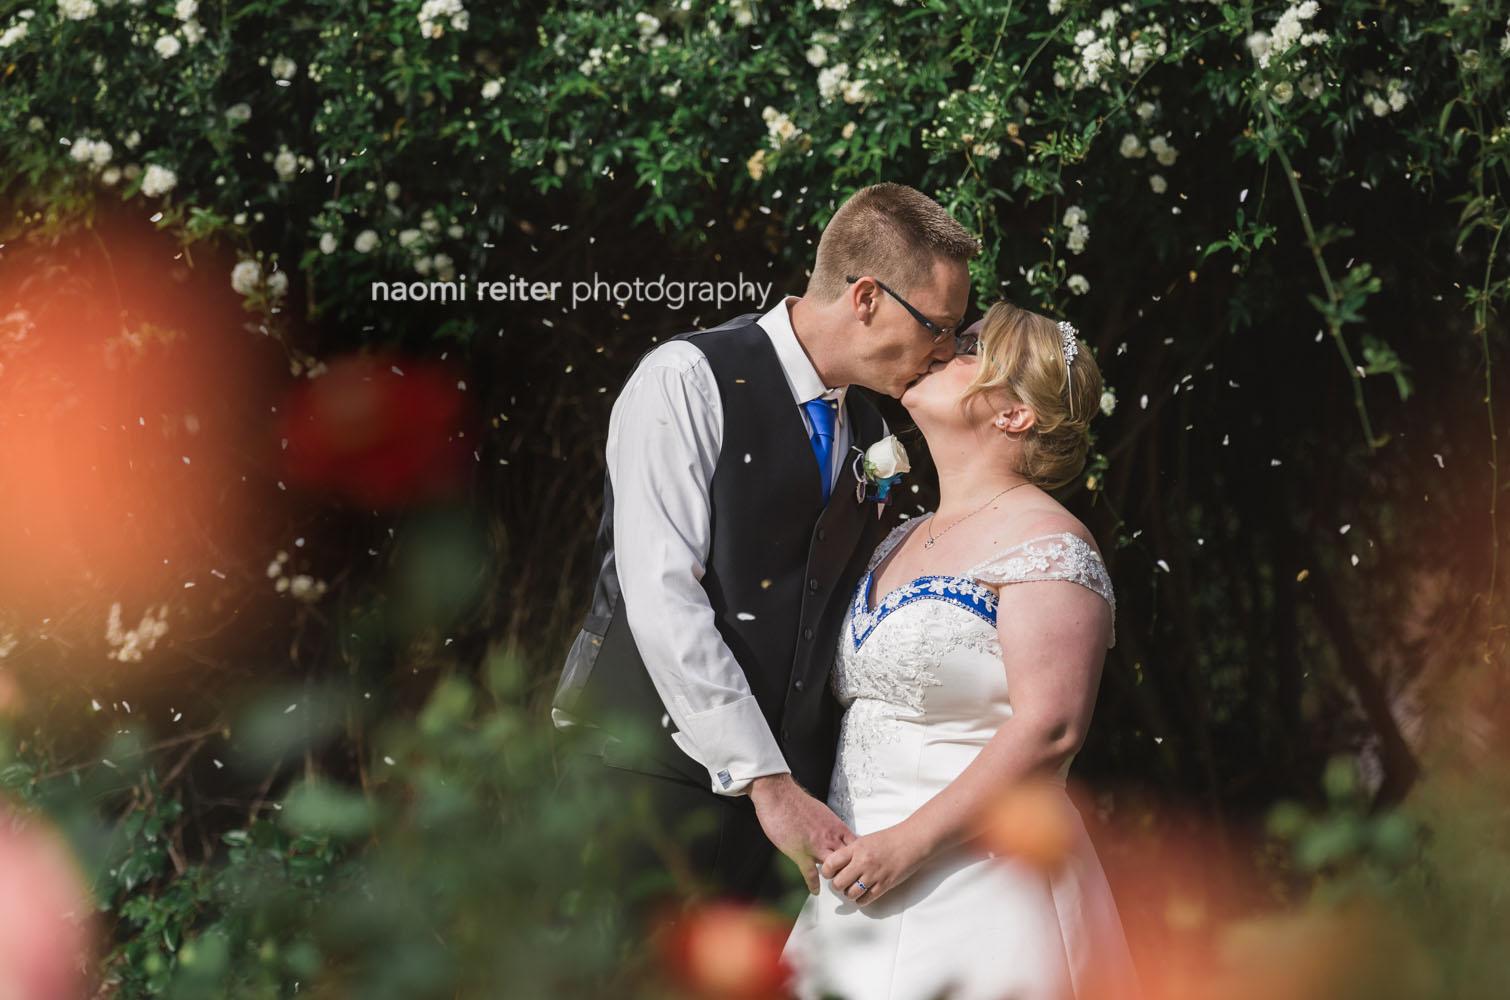 Swanes Nursery, Dural makes a beautiful backdrop for wedding photos – https://www.swanes.com/garden-hire